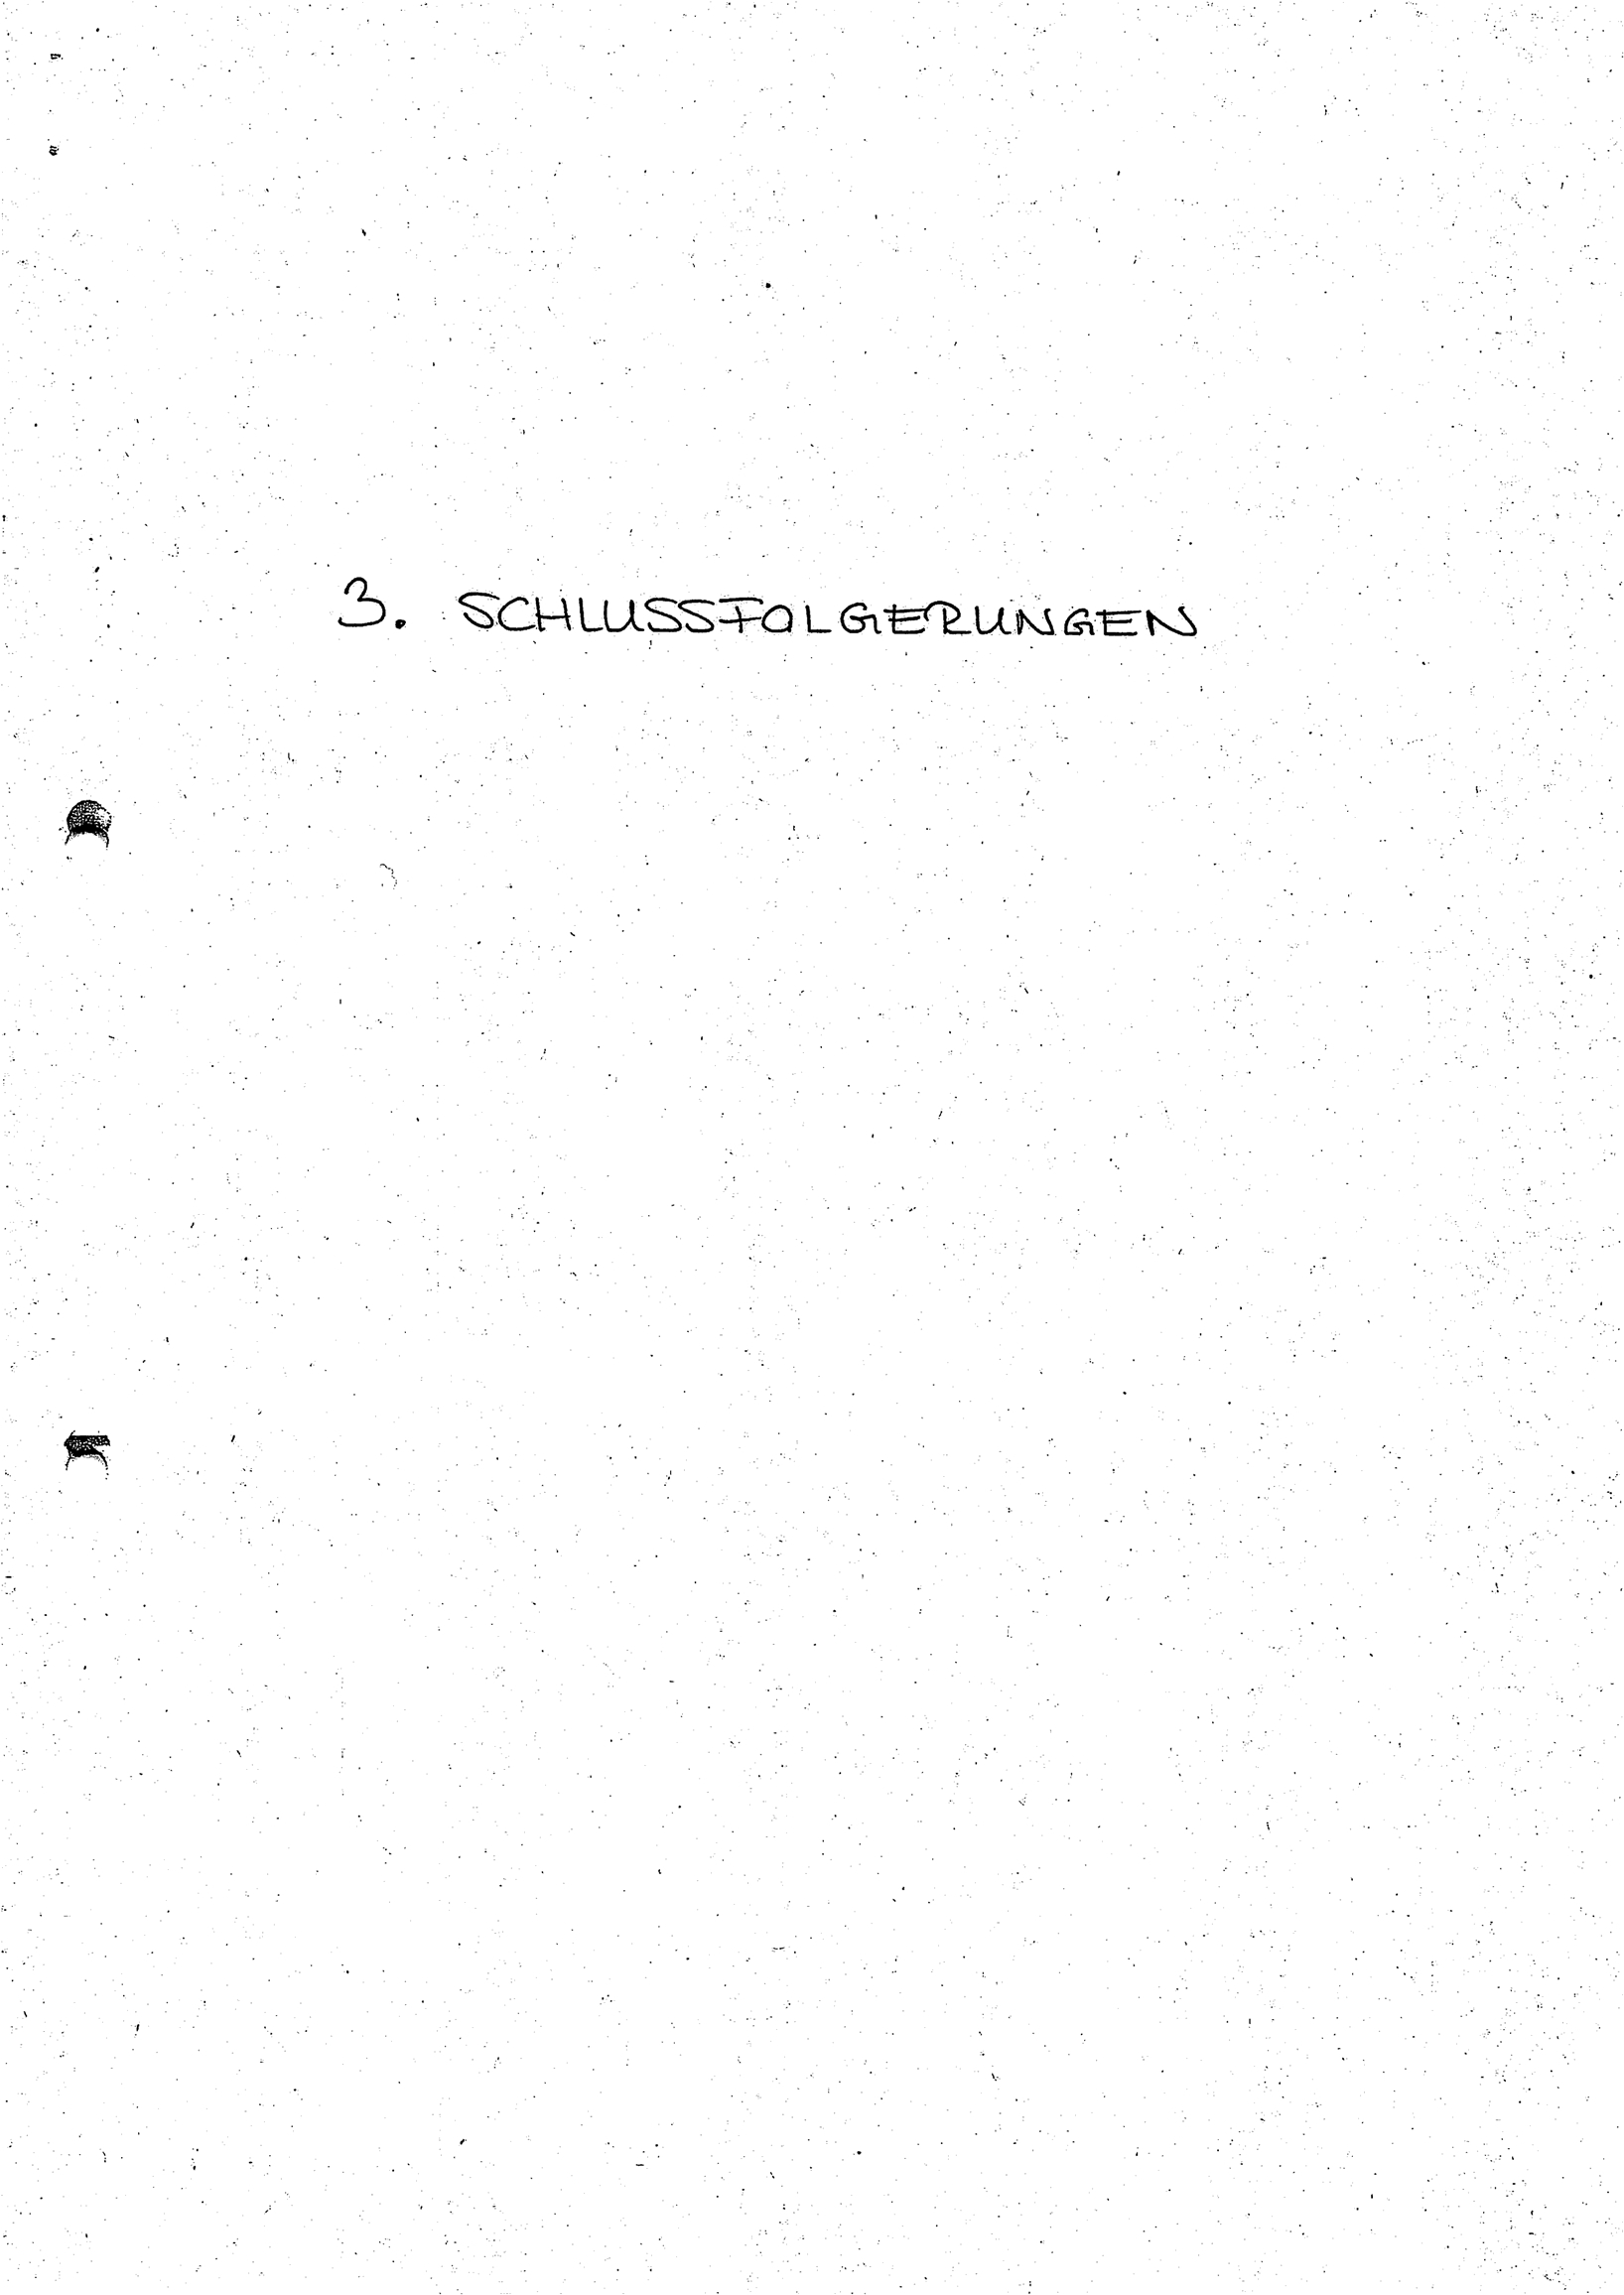 Ulm_KGU_Arbeitsheft_19830425_015_060